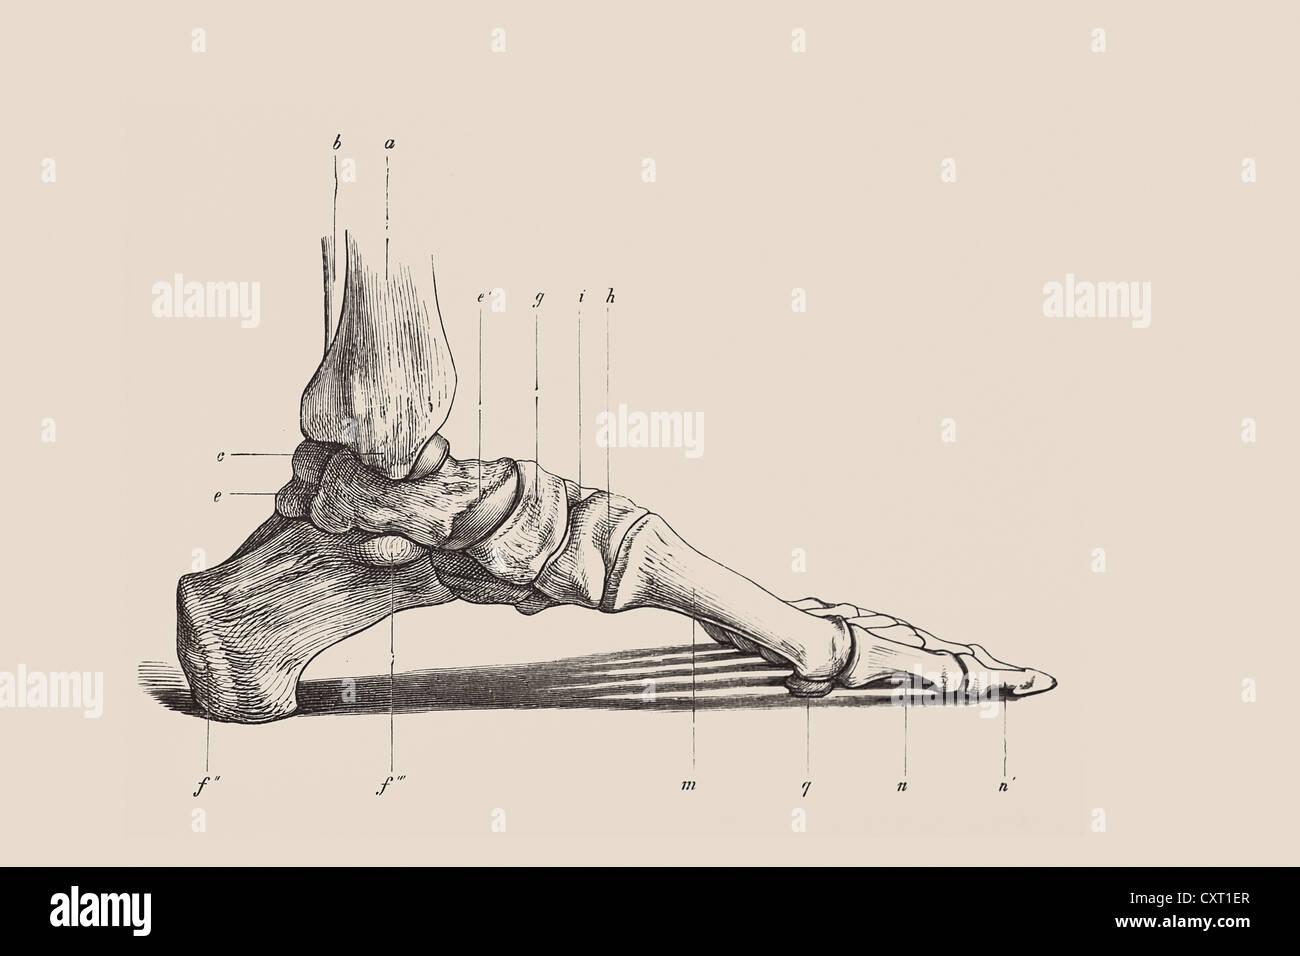 Skeleton Of A Human Foot Anatomical Illustration Stock Photo Alamy